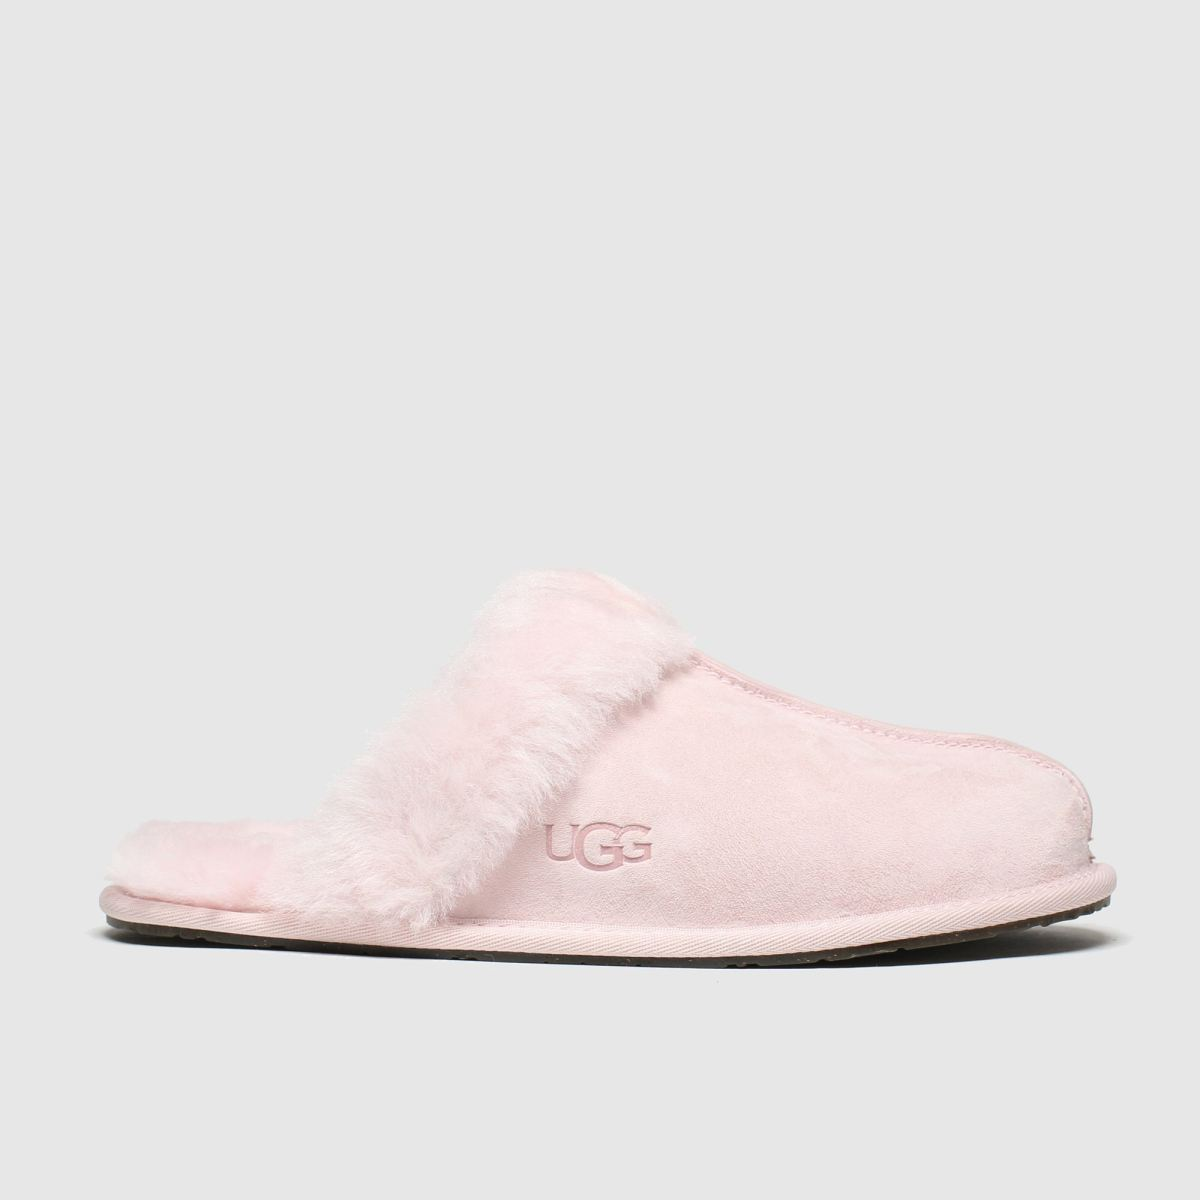 Ugg Pale Pink Scuffette Ii Slippers